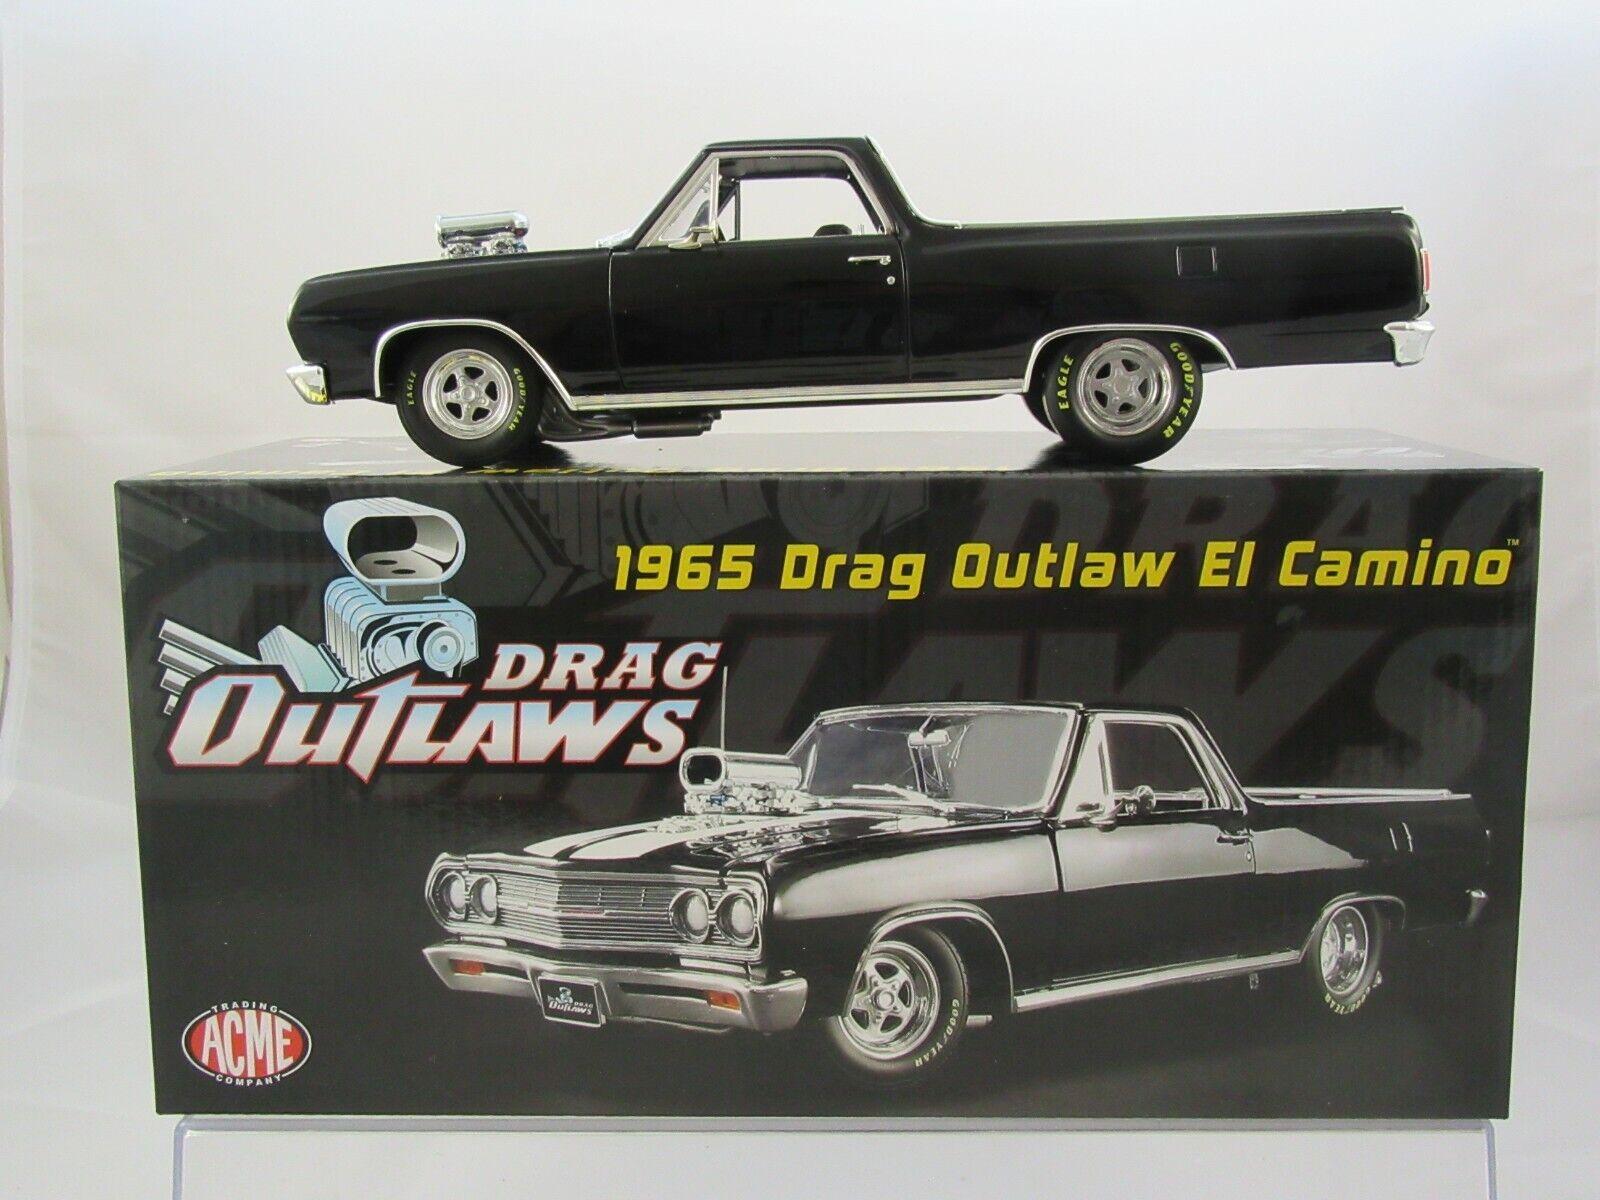 Acme 1965 Drag Outlaw El Camino A1805409